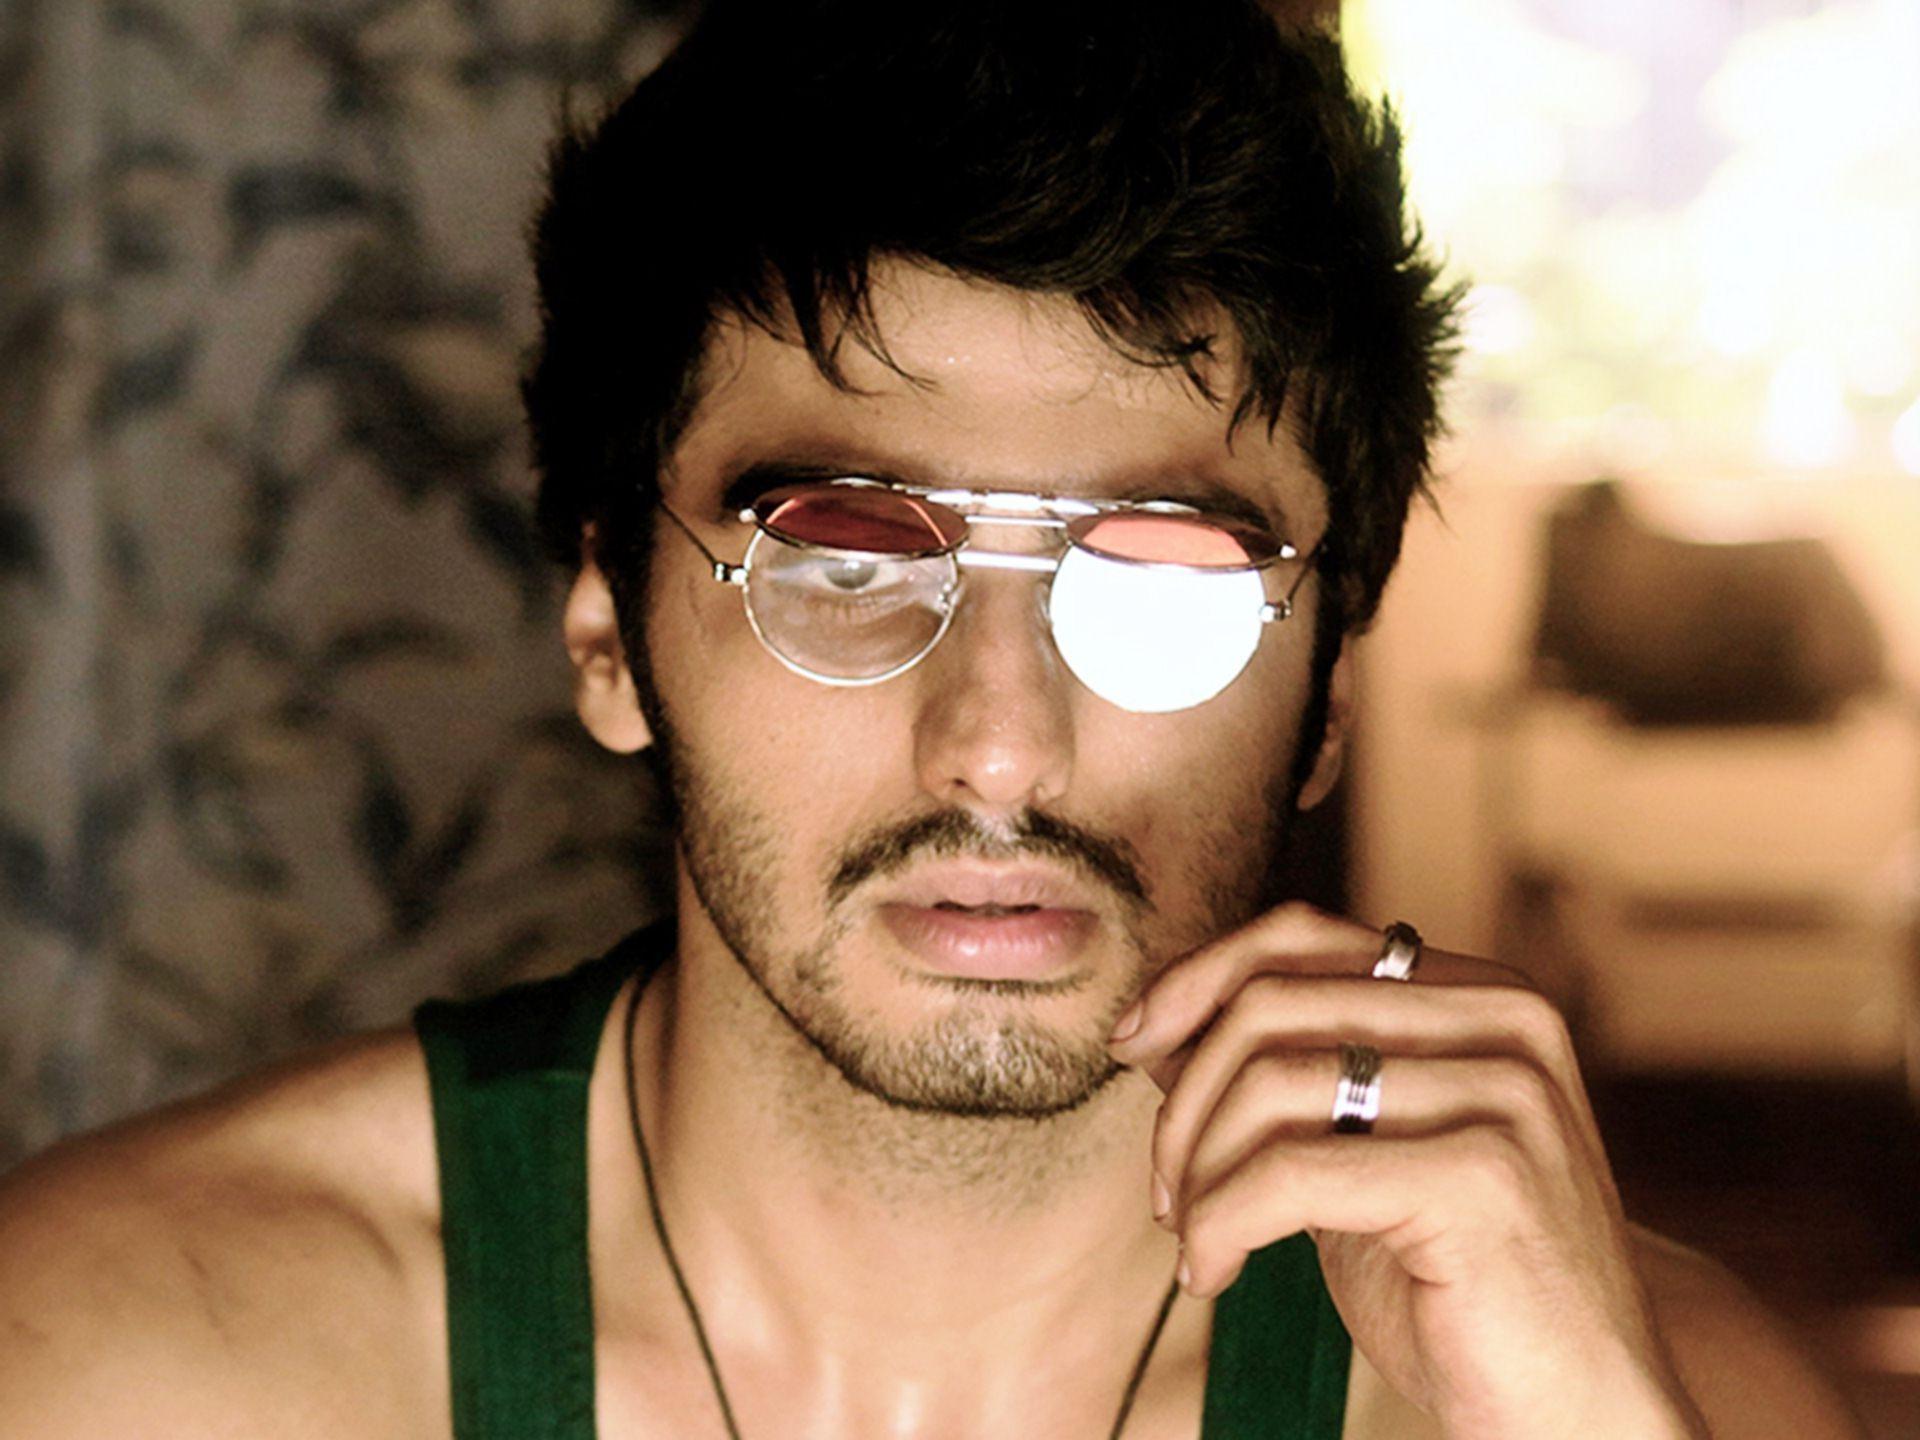 Arjun-Kapoor-In-Finding-Fanny-Photos